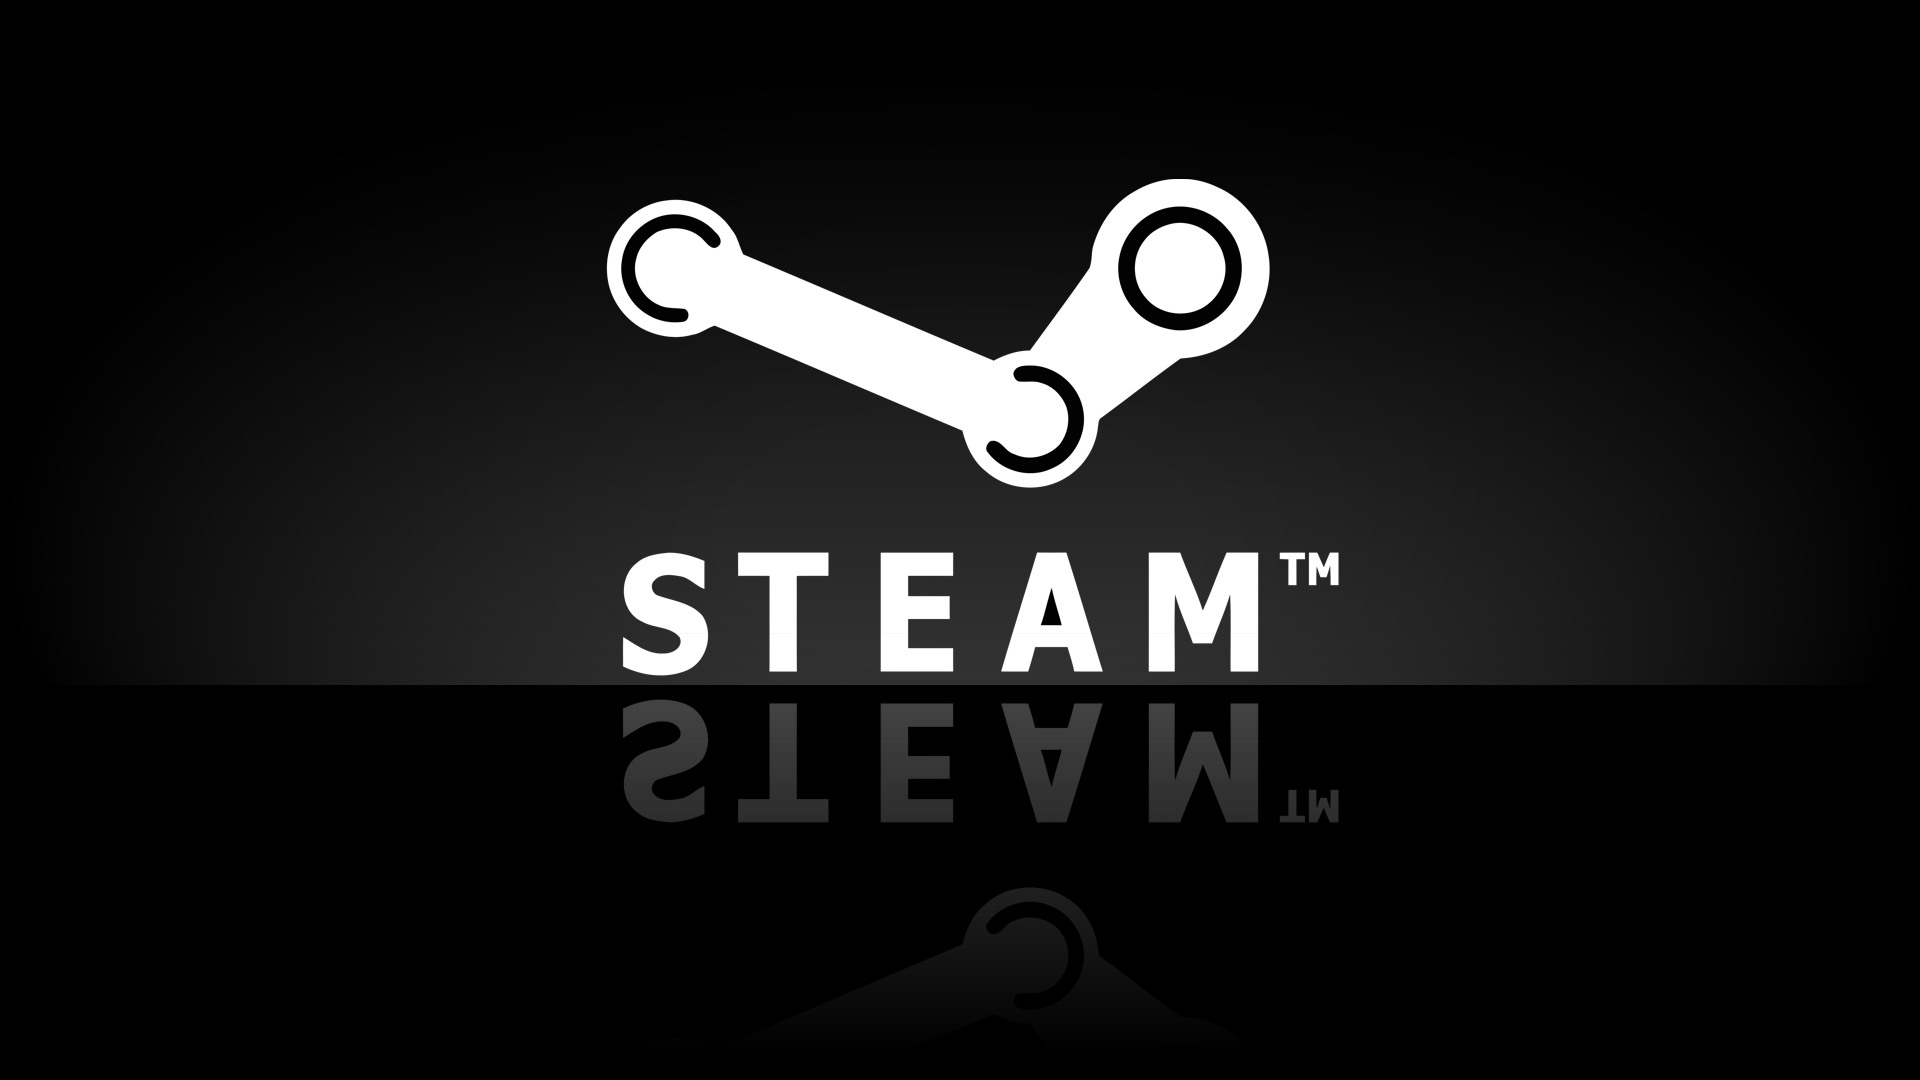 Valve پس از تخفیفات تابستانی حساب کاربری ۴۰۰۰۰ چیتر را بن کرد